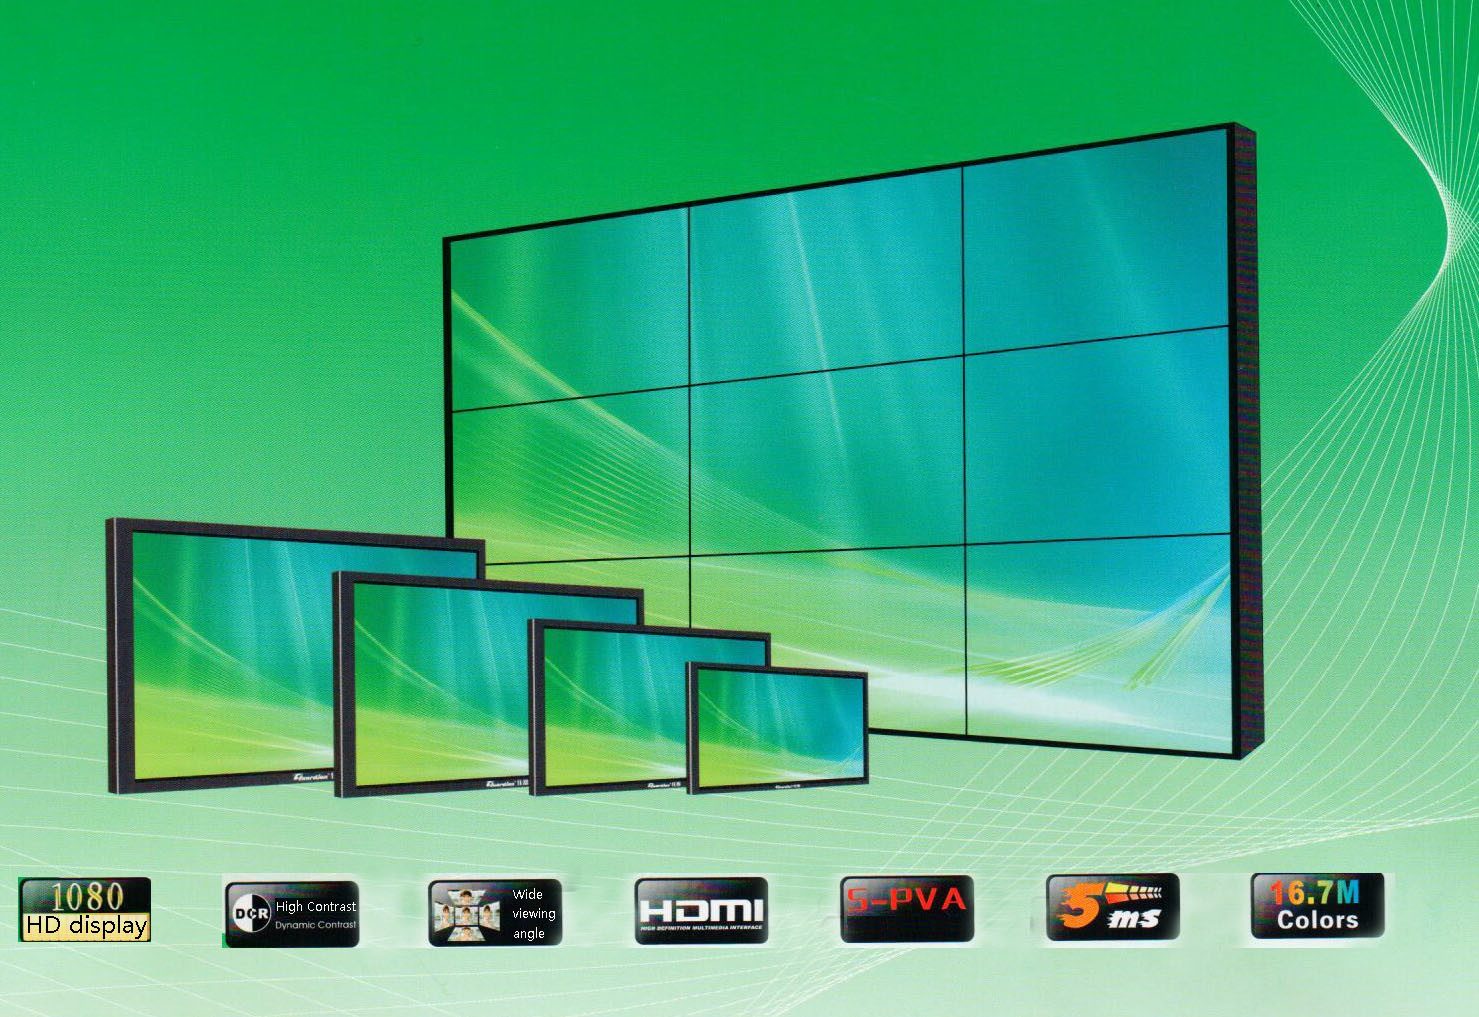 Display a cristalli liquidi da 46 pollici con piastrelle Mosaic ultra strette da 6,7 mm TV a grande schermo a parete Patchwork